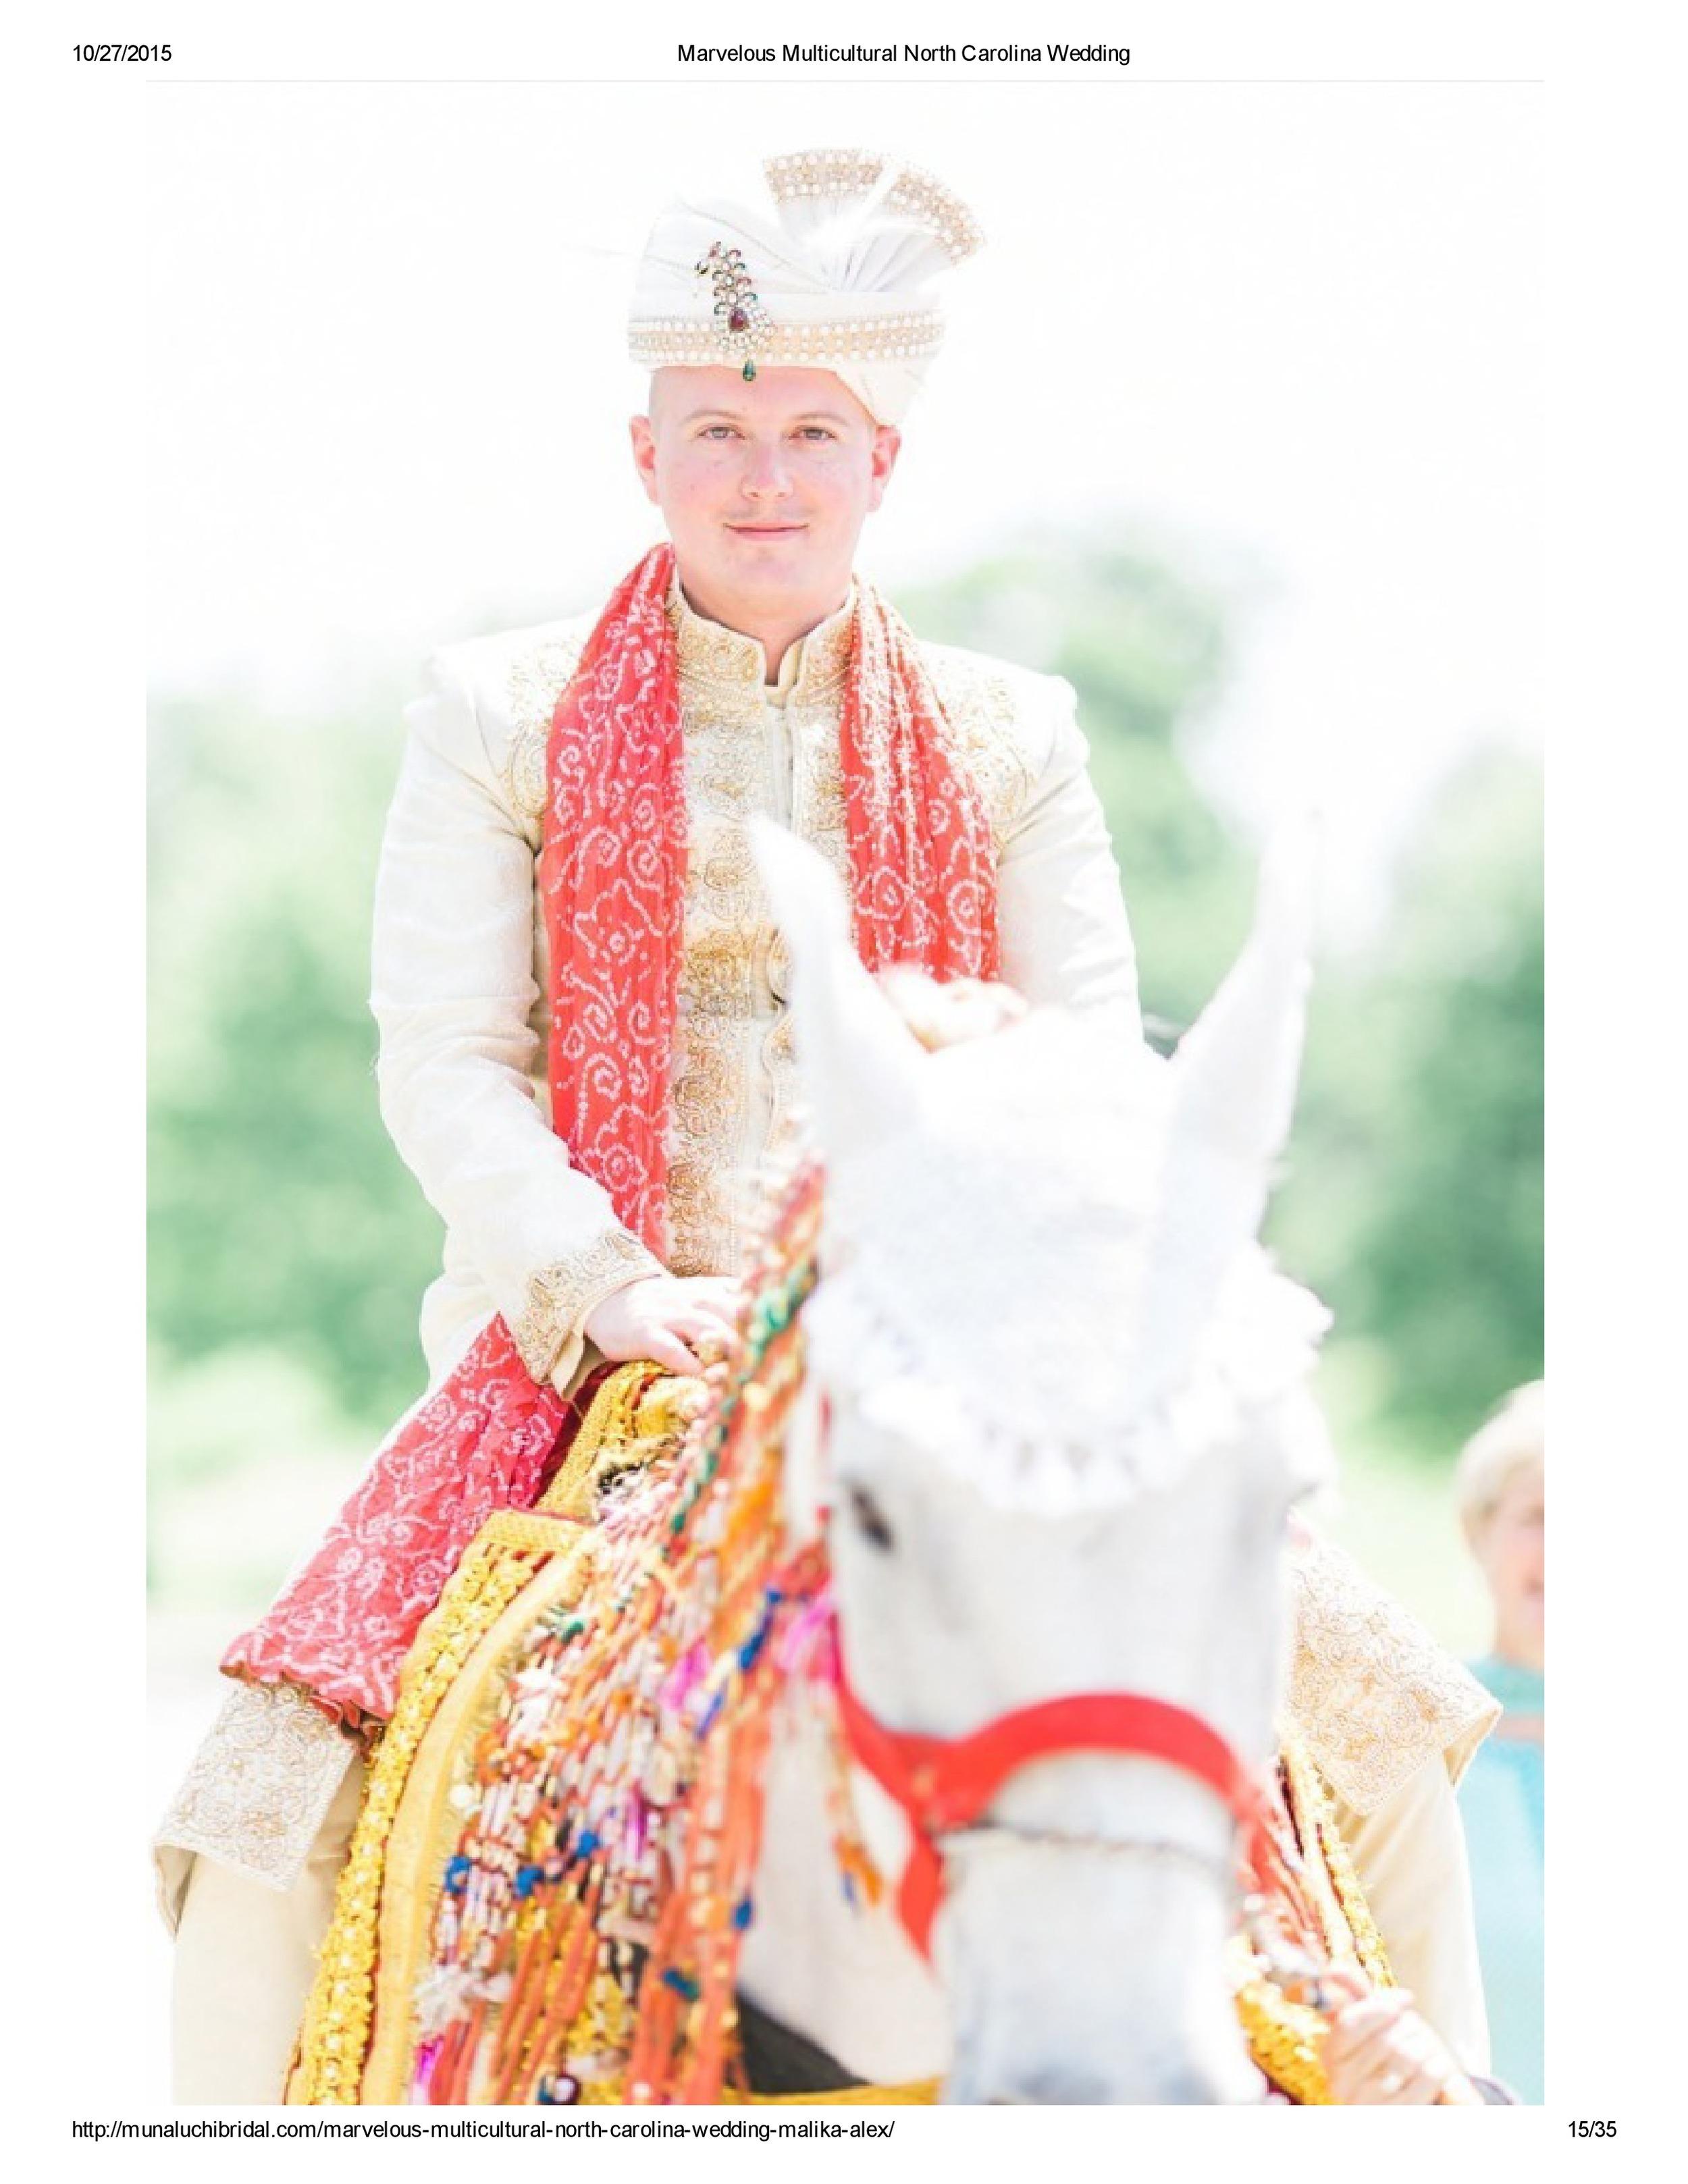 Marvelous Multicultural North Carolina Wedding - Alex & Malika-page-14.jpg